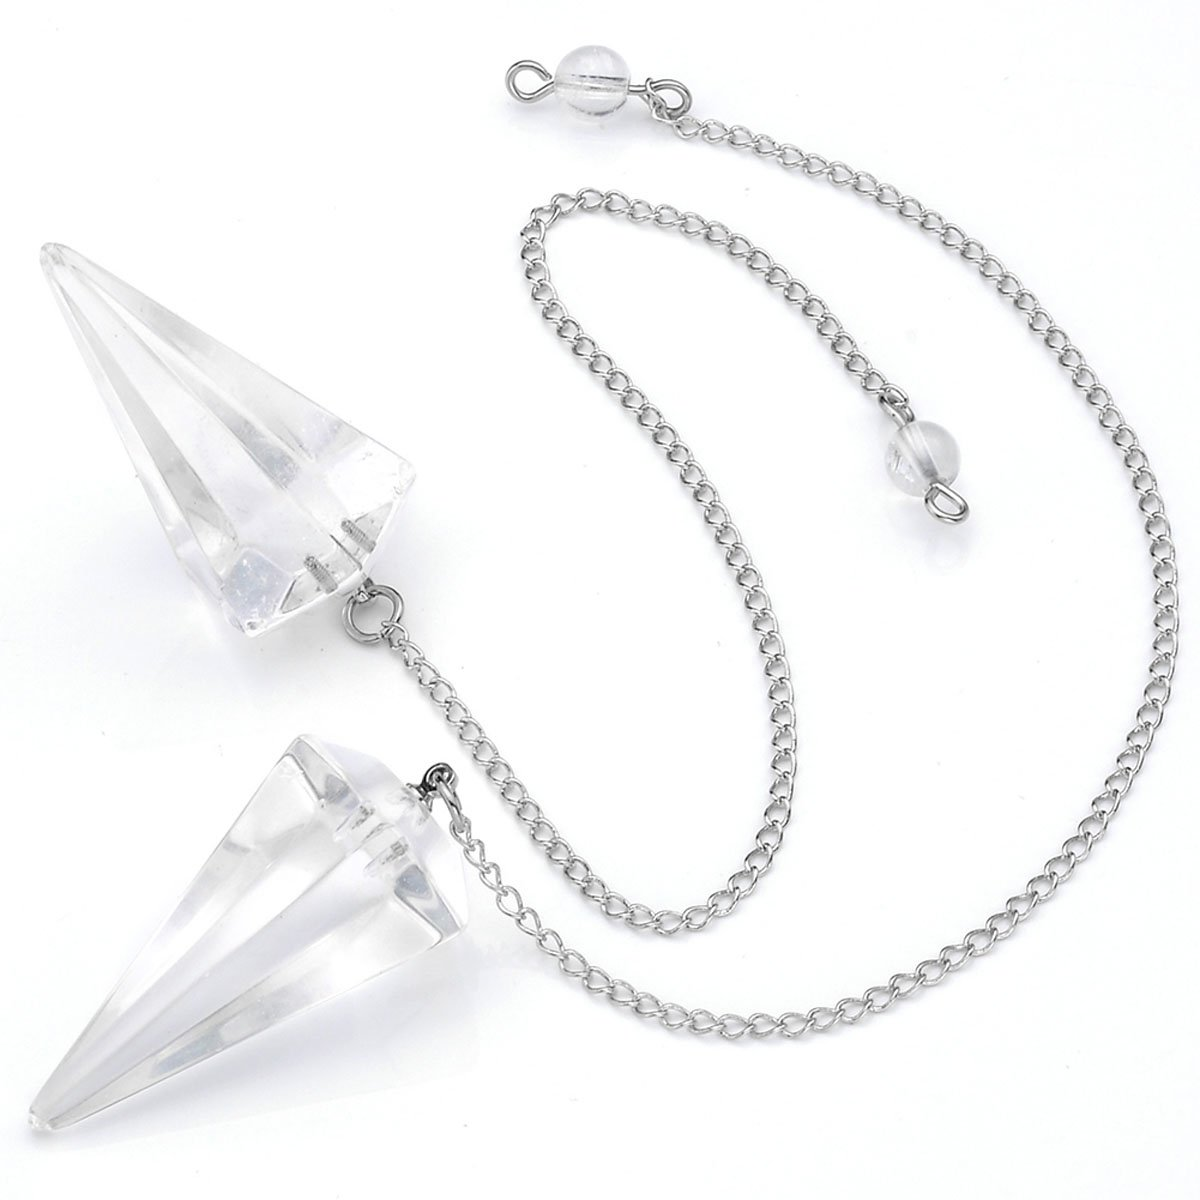 Balancing Rough Amethyst Rose Quartz Stones for Reiki Meditation CrystalTears Healing Crystals Therapy Kit~7 Chakra Gemstone Pendulum for Dowsing Divination